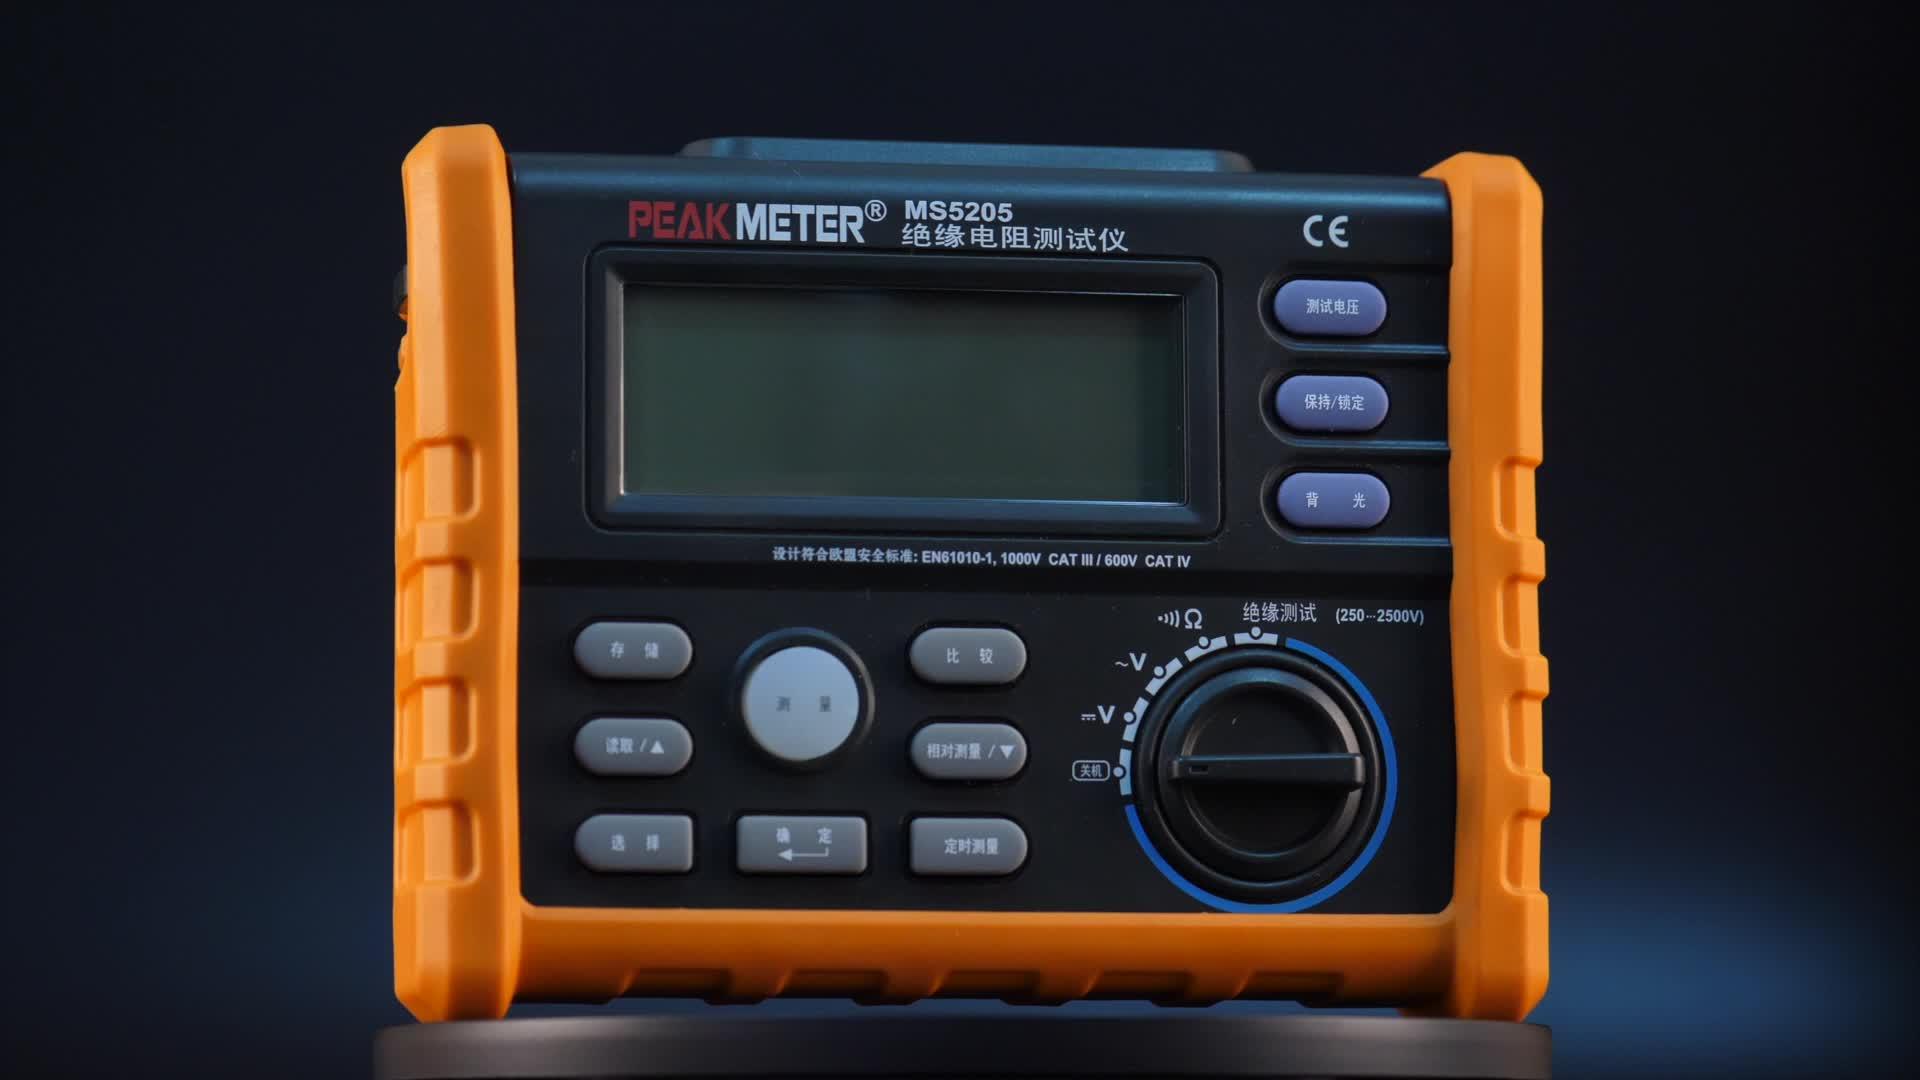 MS5205 megger voltaje Digital comprobador de aislamiento de 1000, 2500v resistencia aislar tester multímetro indicación de bajo voltaje analógicas